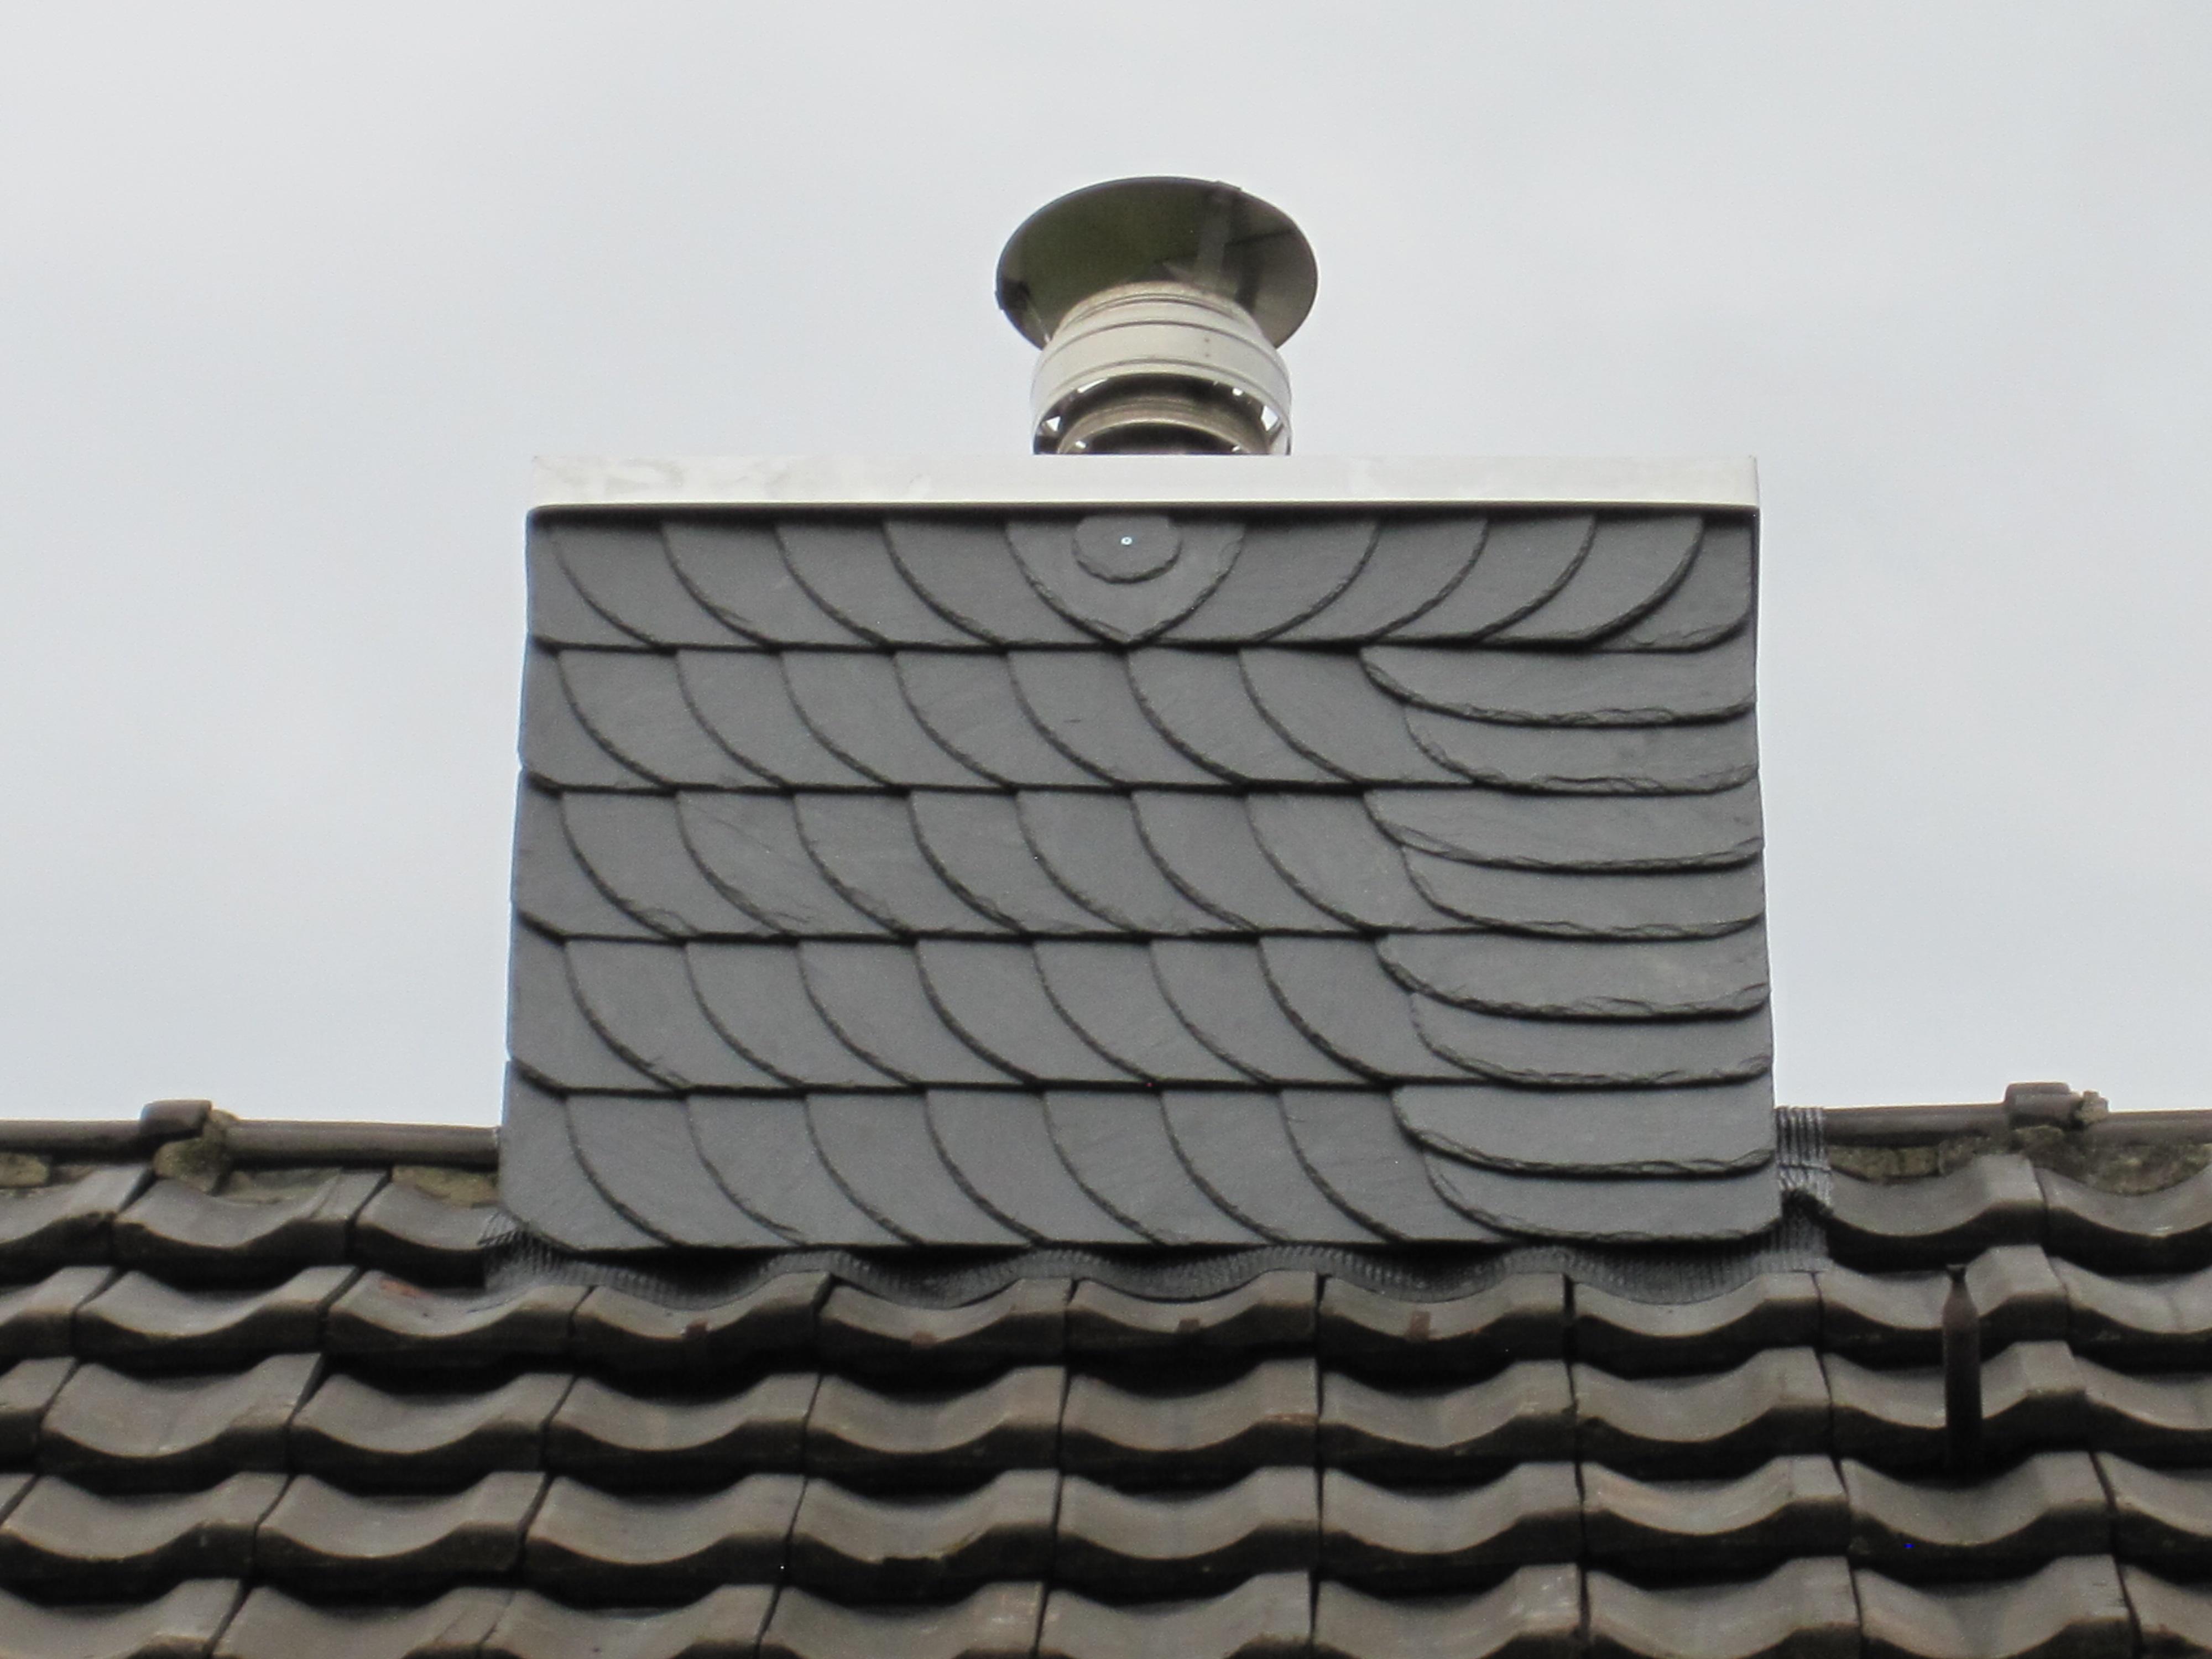 Schieferarbeiten | Dachtechnik Pohl - Dachdecker in Moers & Duisburg